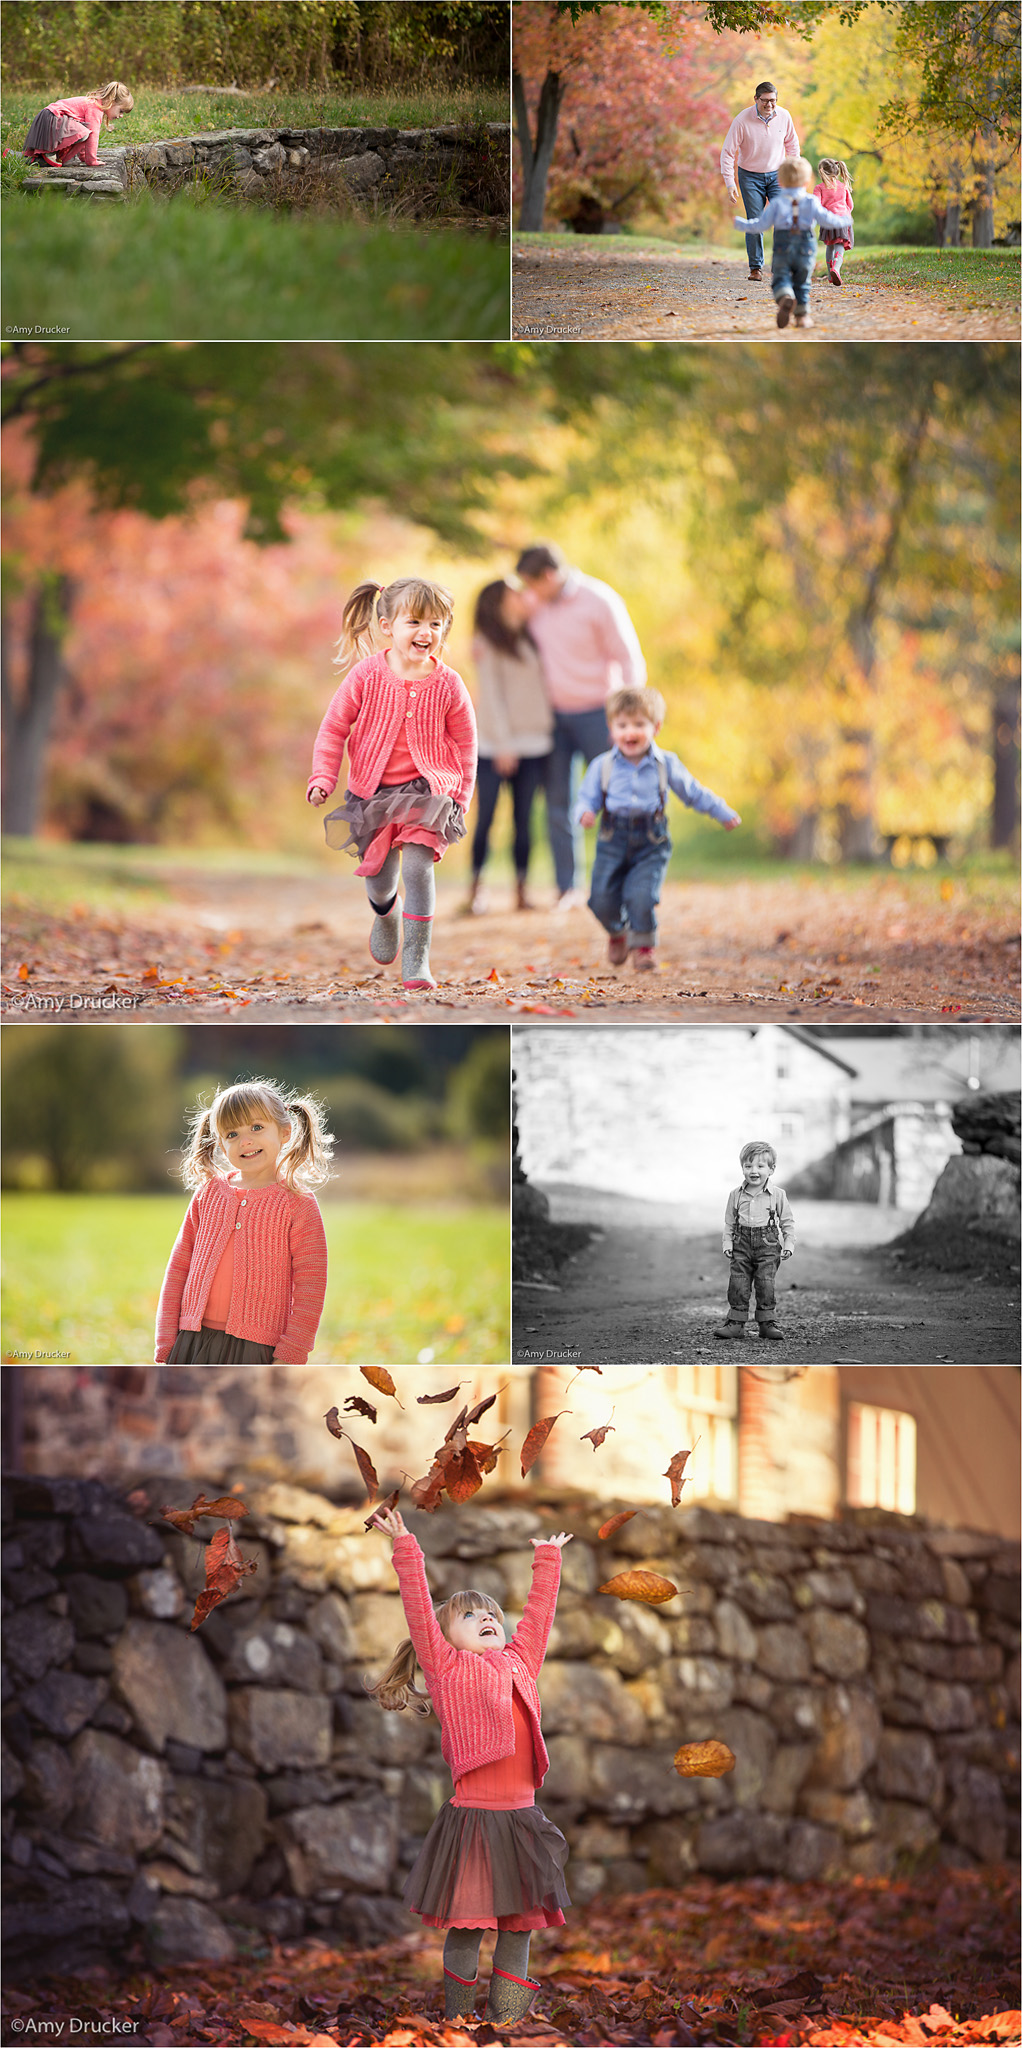 amy_drucker_new_york_lifestyle_family_photography_4